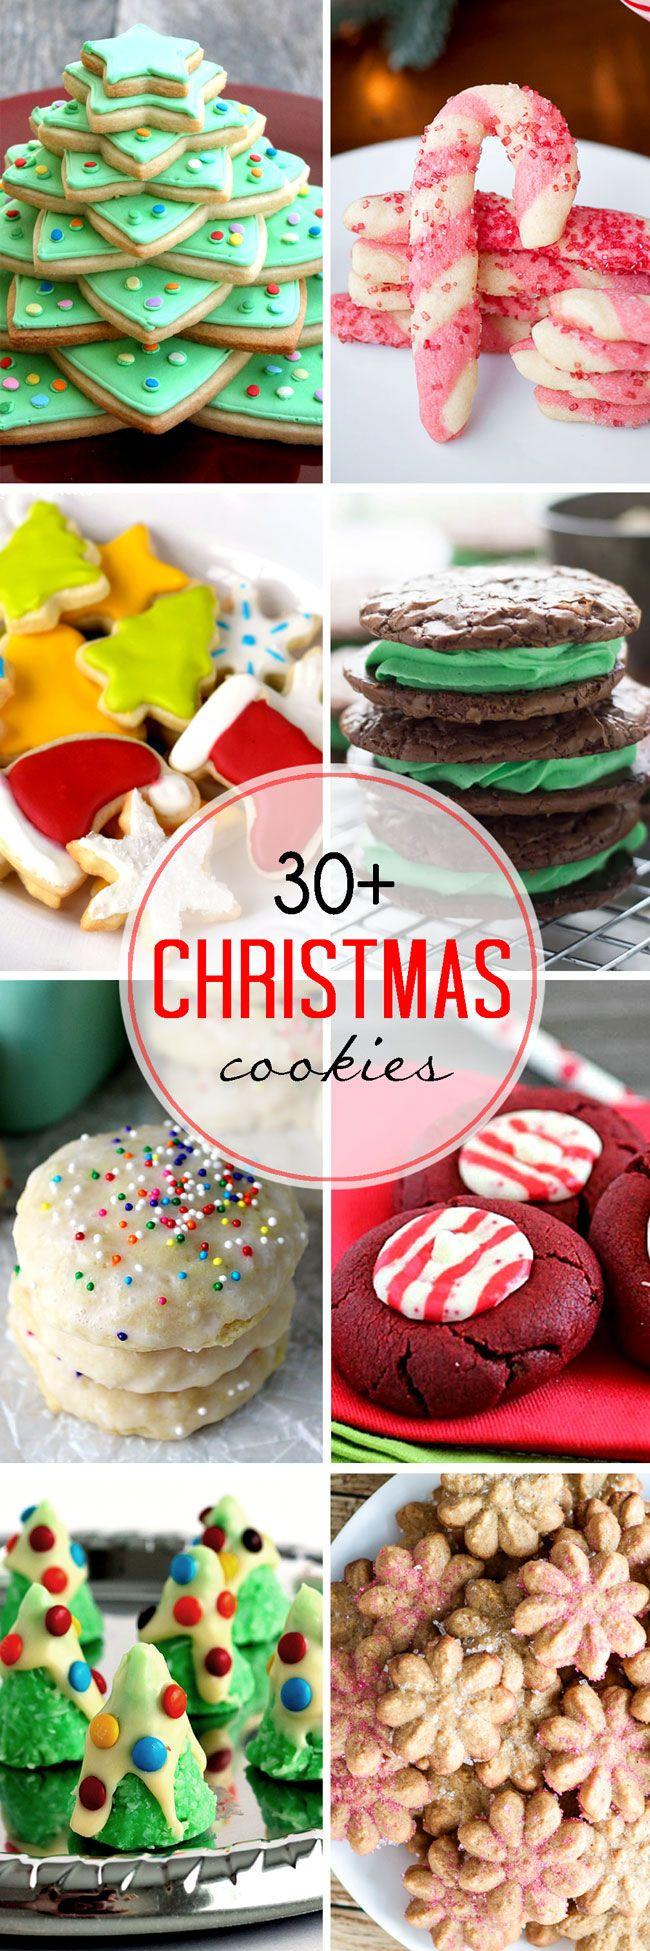 Christmas Cookies Recipe Pinterest  100 Christmas Cookie Recipes on Pinterest